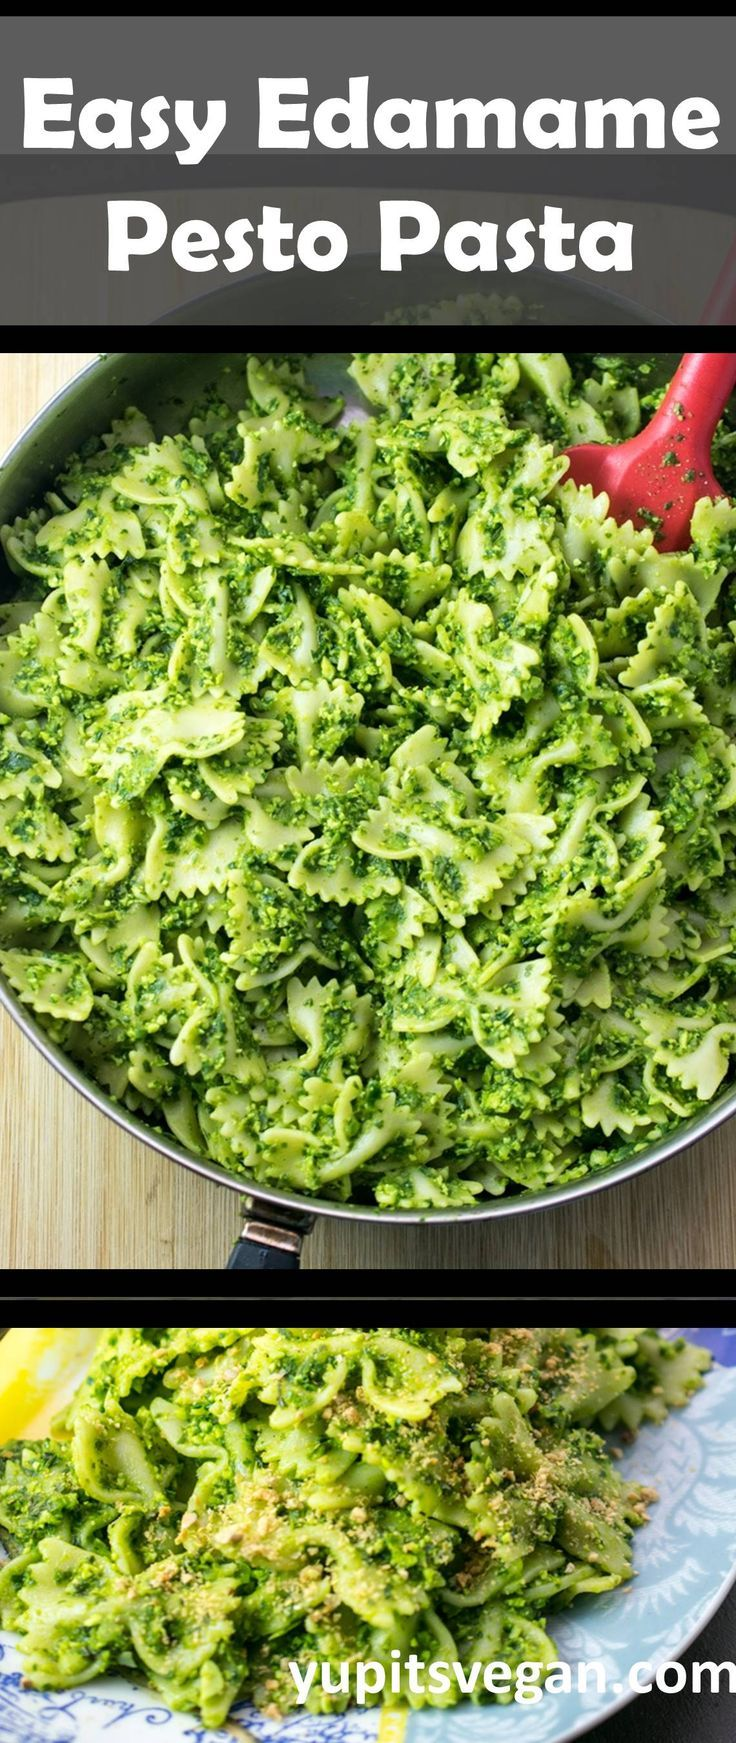 Edamame Pesto Pasta | Yup, it's Vegan. #Vegan and #DairyFree pesto packed with protein and fresh basil flavor! #Pesto #Spinach